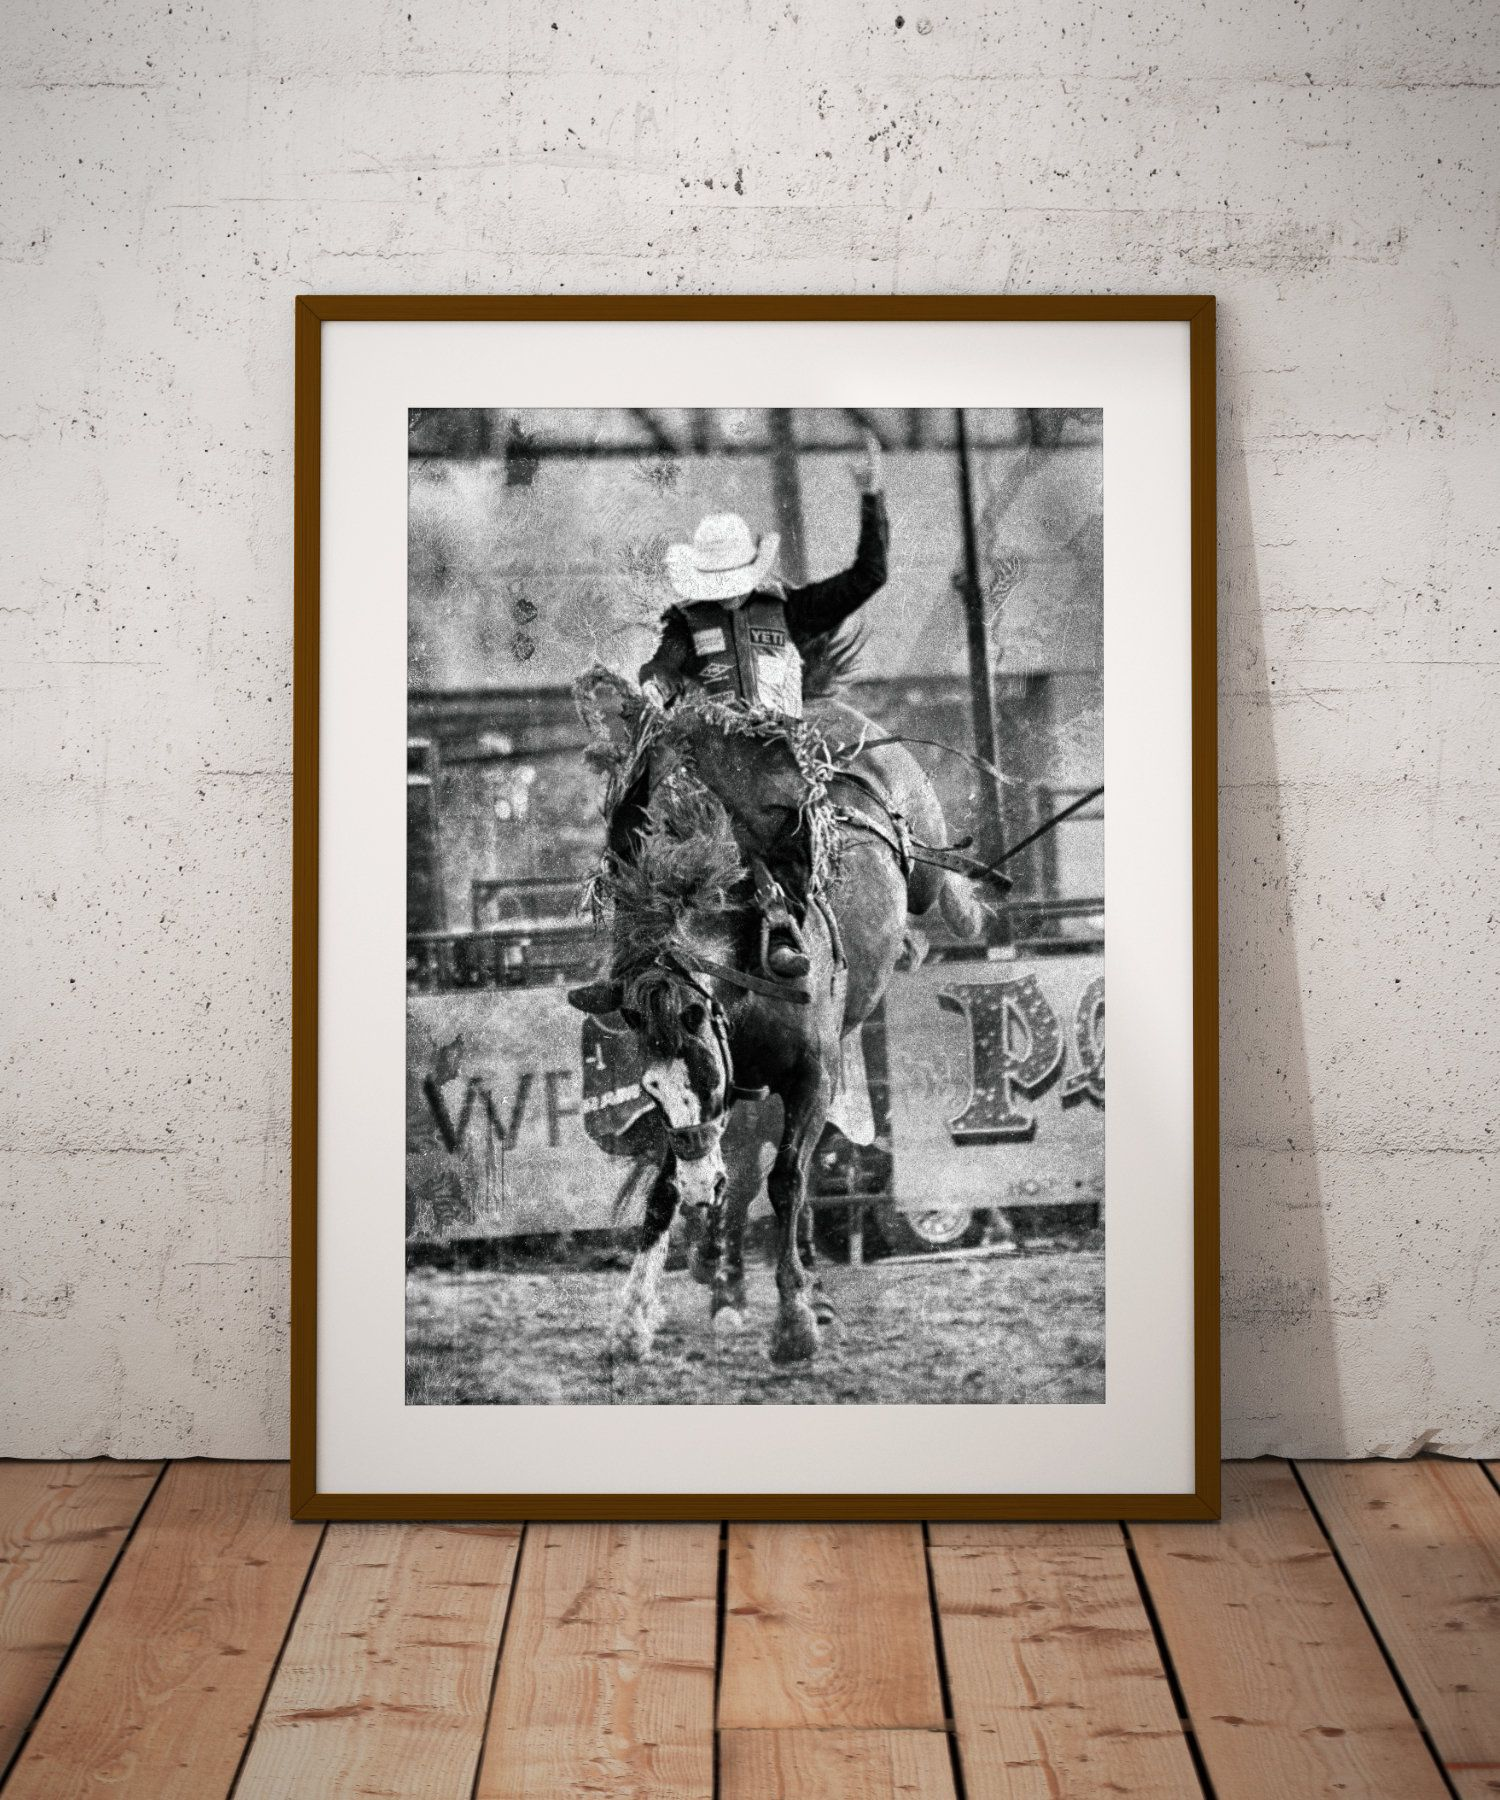 Cowboy Print Vintage Cowboy Poster Rodeo Wall Art Black And Etsy Cowboy Wall Art Cowboy Posters Fine Art Prints Photographs